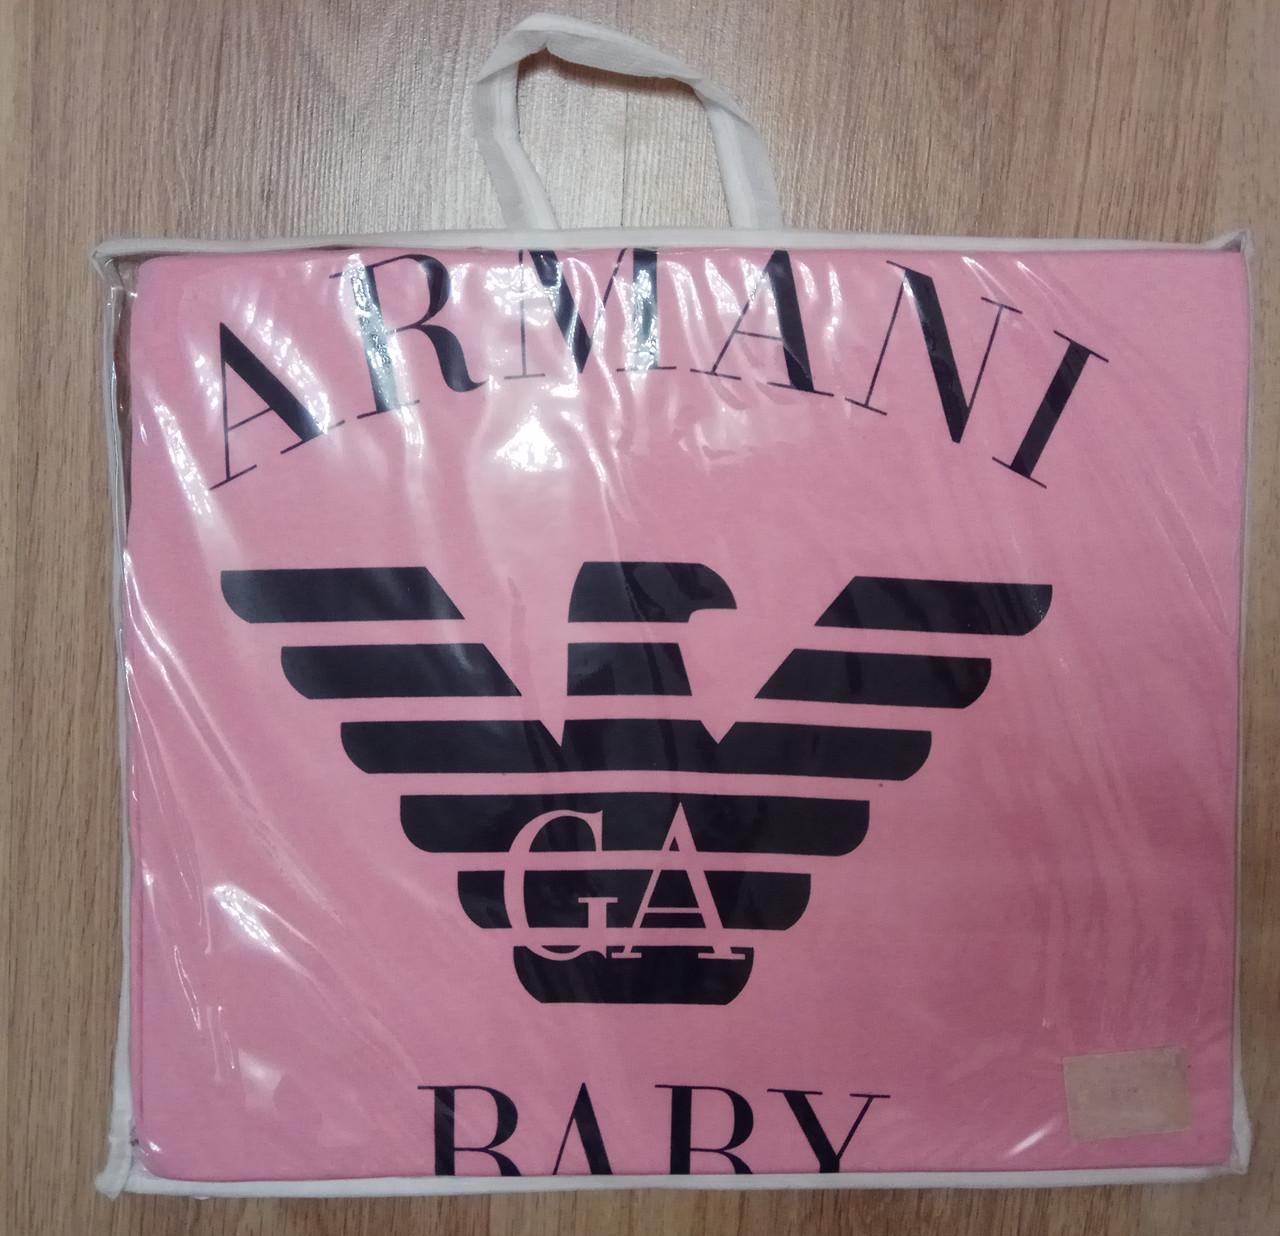 8fa47d7f4f29 Плед для новорожденного с уголком, Armani: продажа, цена в Днепре ...